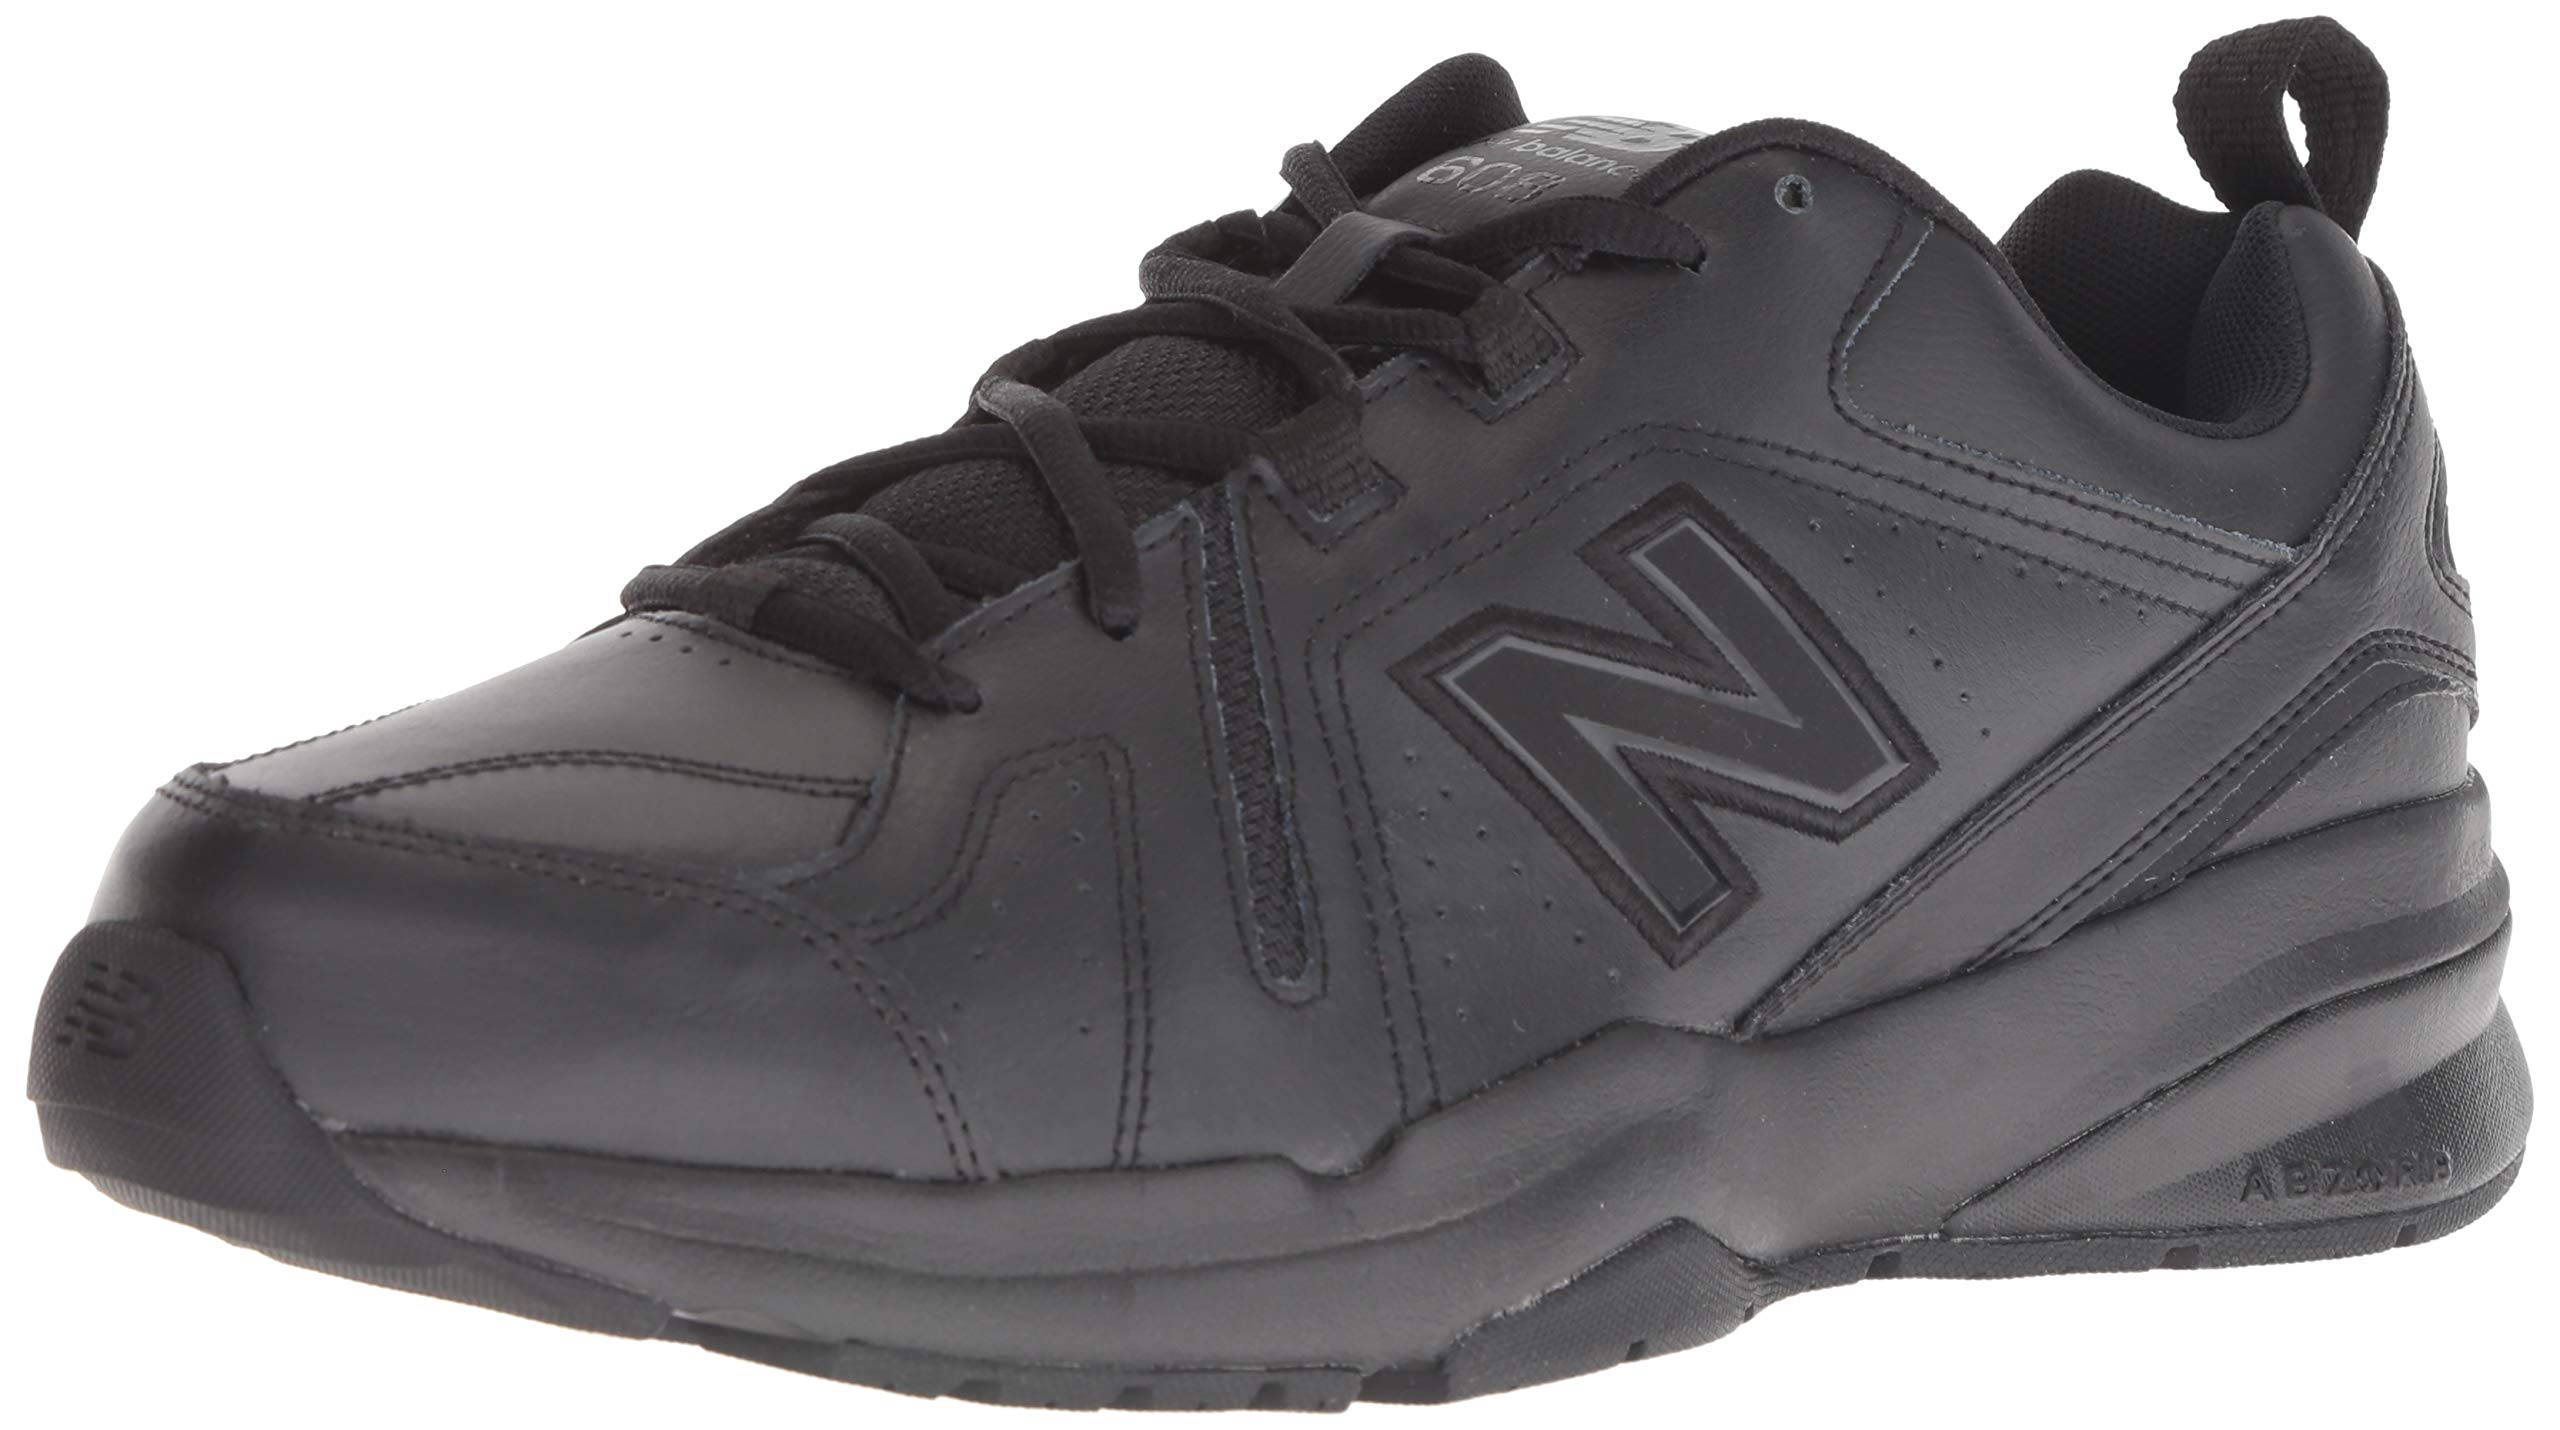 New Balance Men's 608v5 Casual Comfort Cross Trainer Black, 6.5 D US